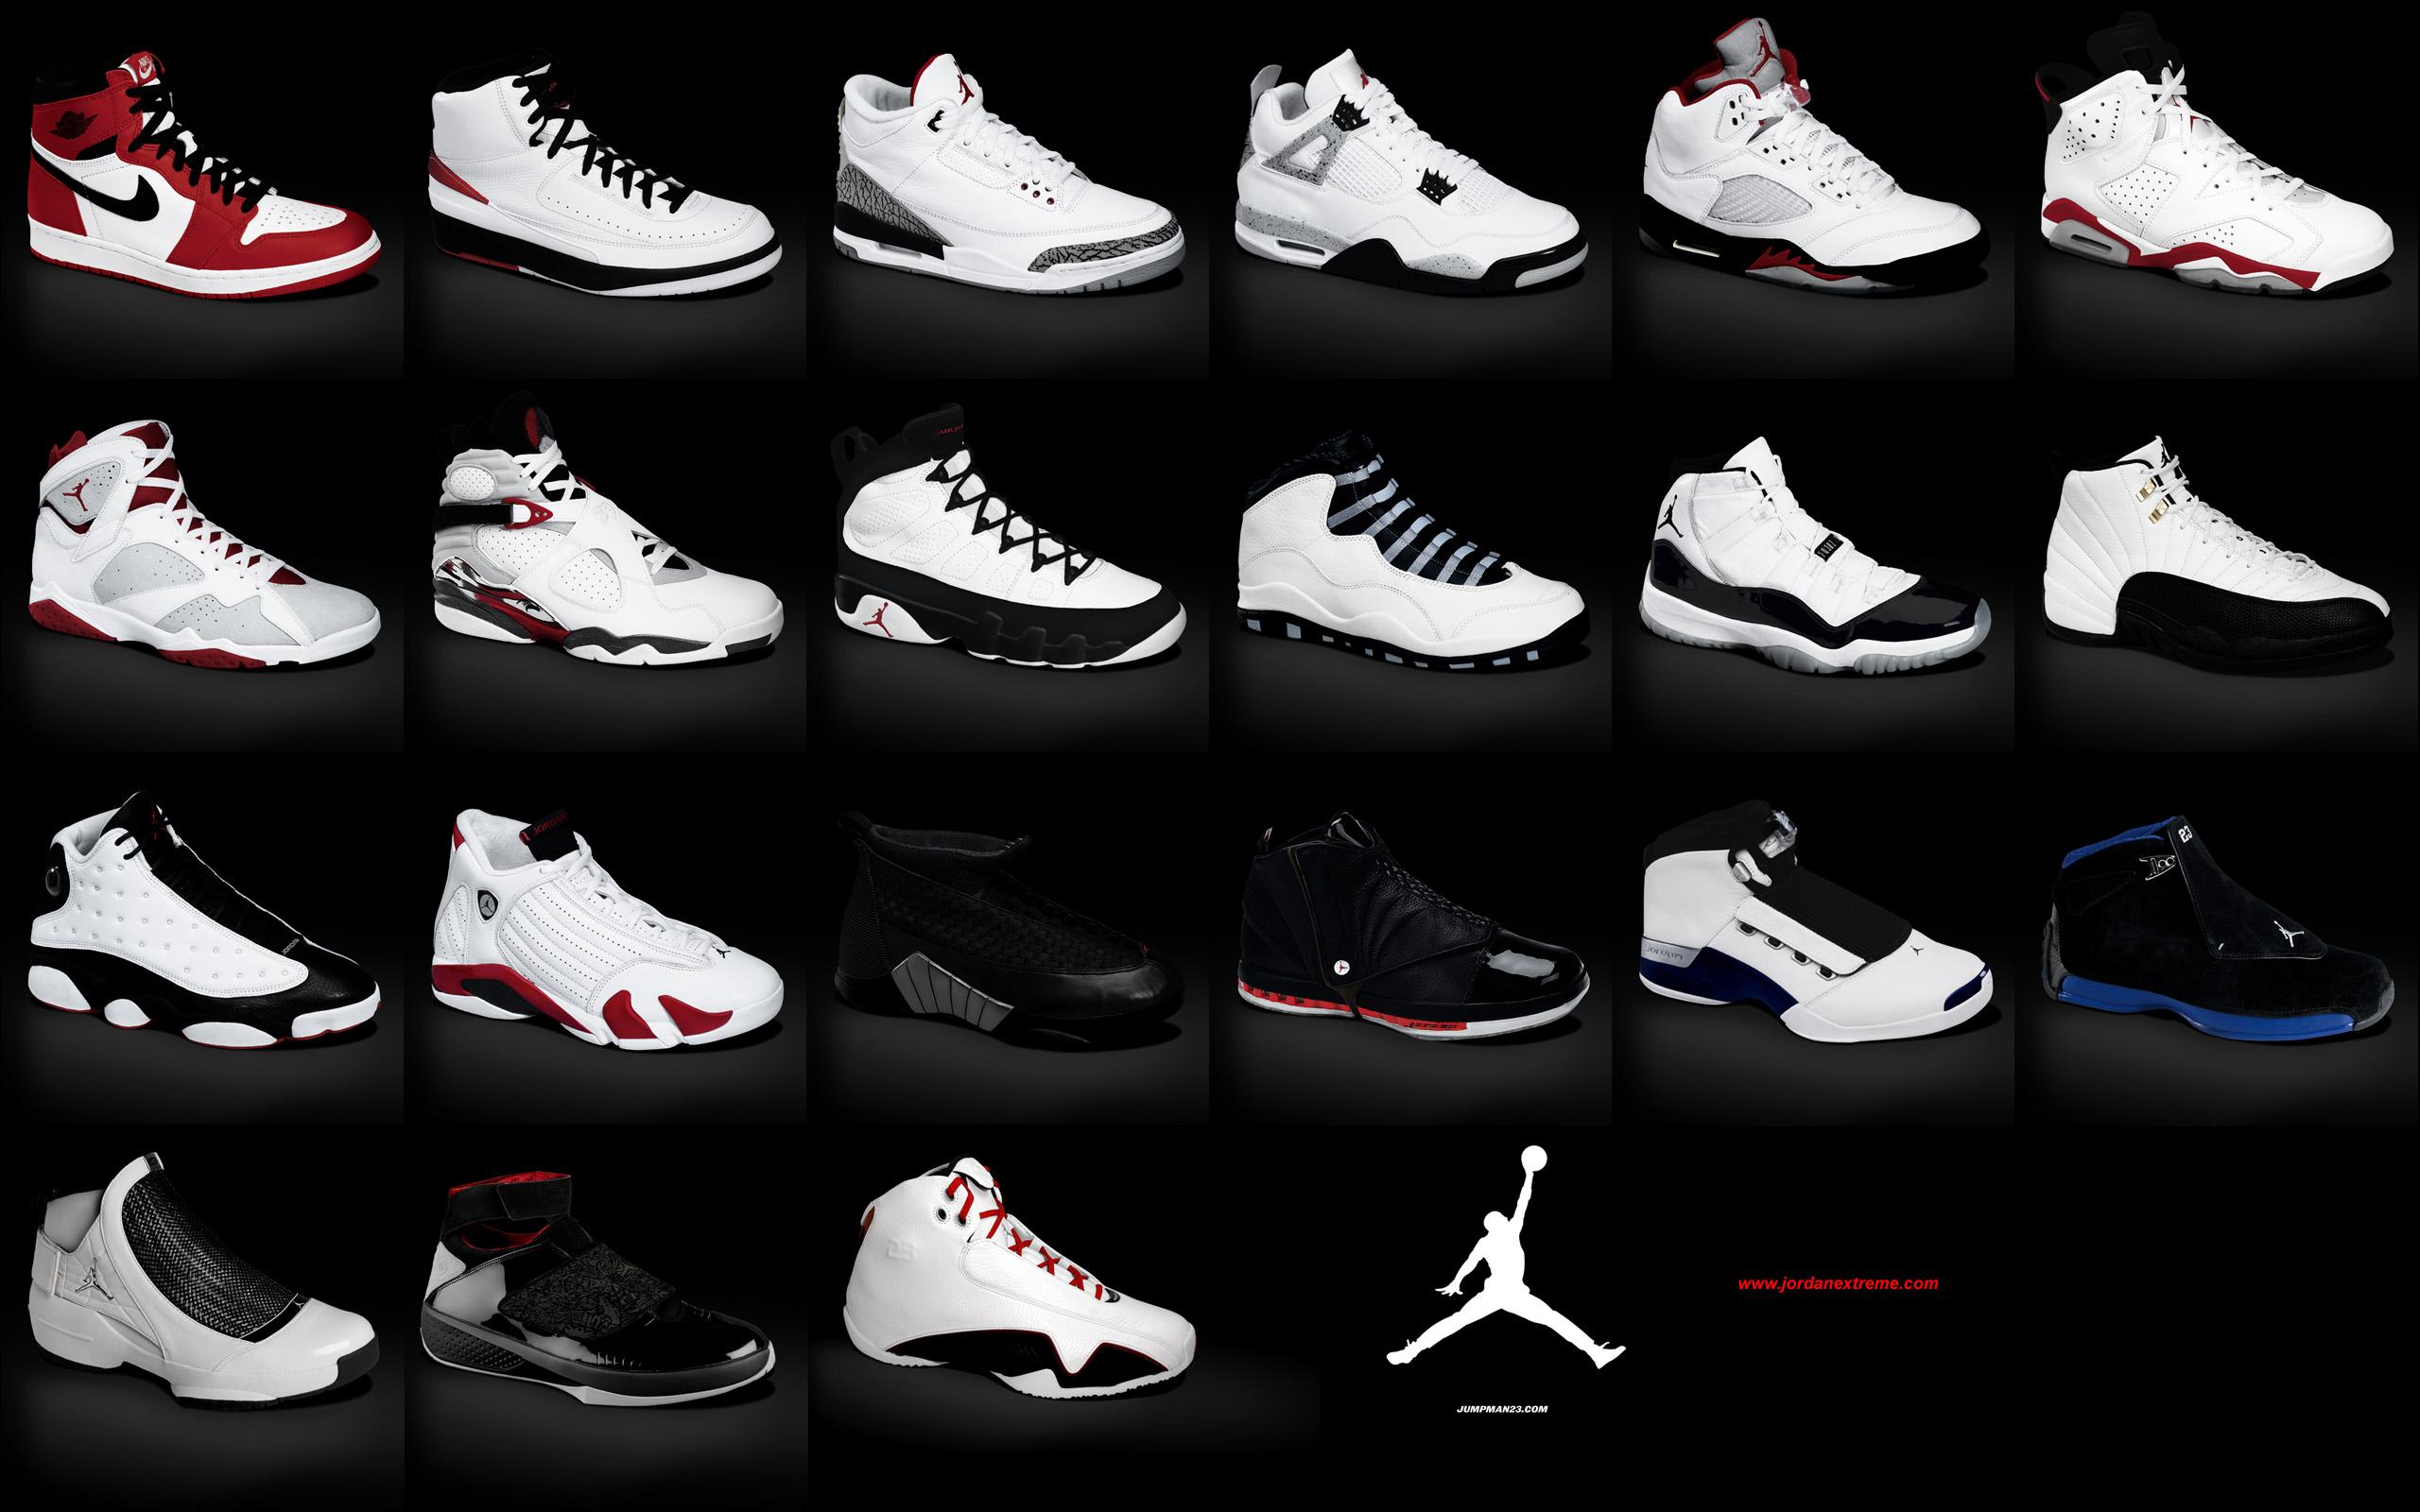 Air Jordan Wallpaper Jordan Shoes 112068 Hd Wallpaper